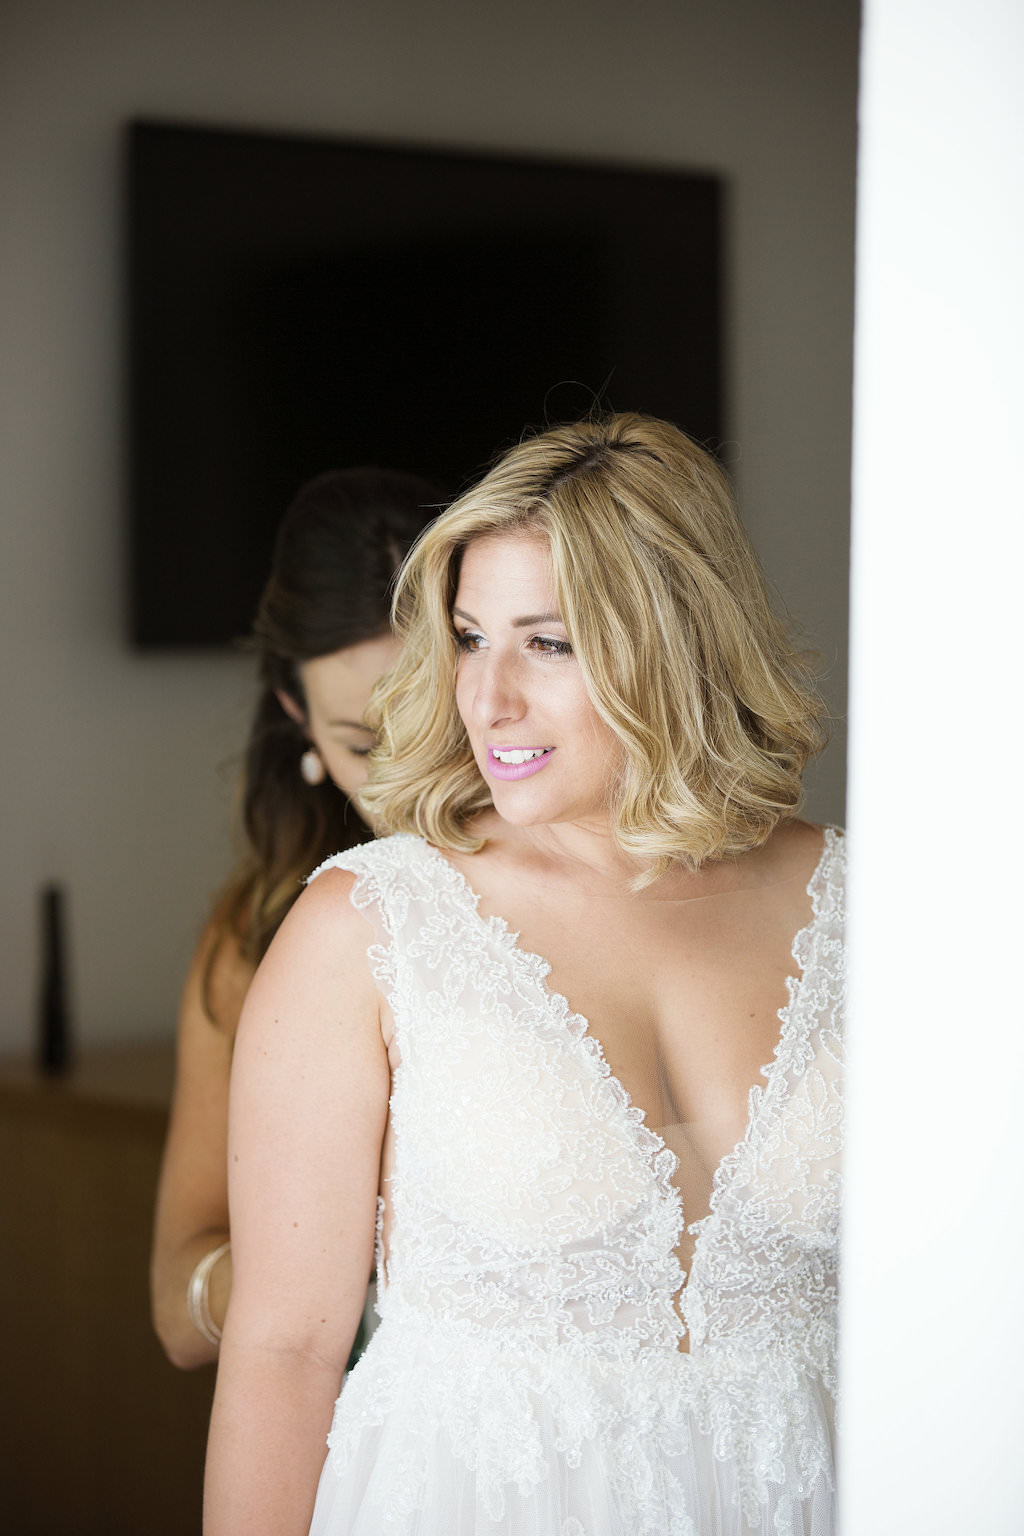 Florida Bride Getting Ready Wedding Portrait in Deep V-Neckline Lace Tank Top Strap Wedding Dress | Tampa Bay Bridal Boutique Truly Forever Bridal